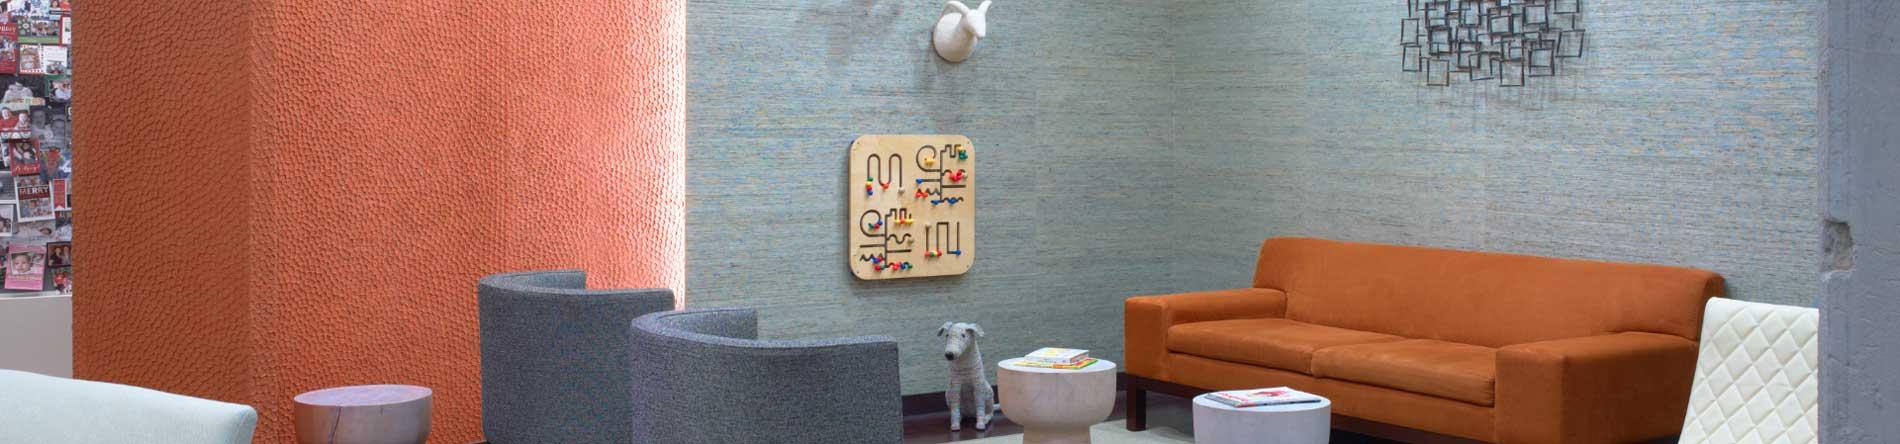 Waiting room interior